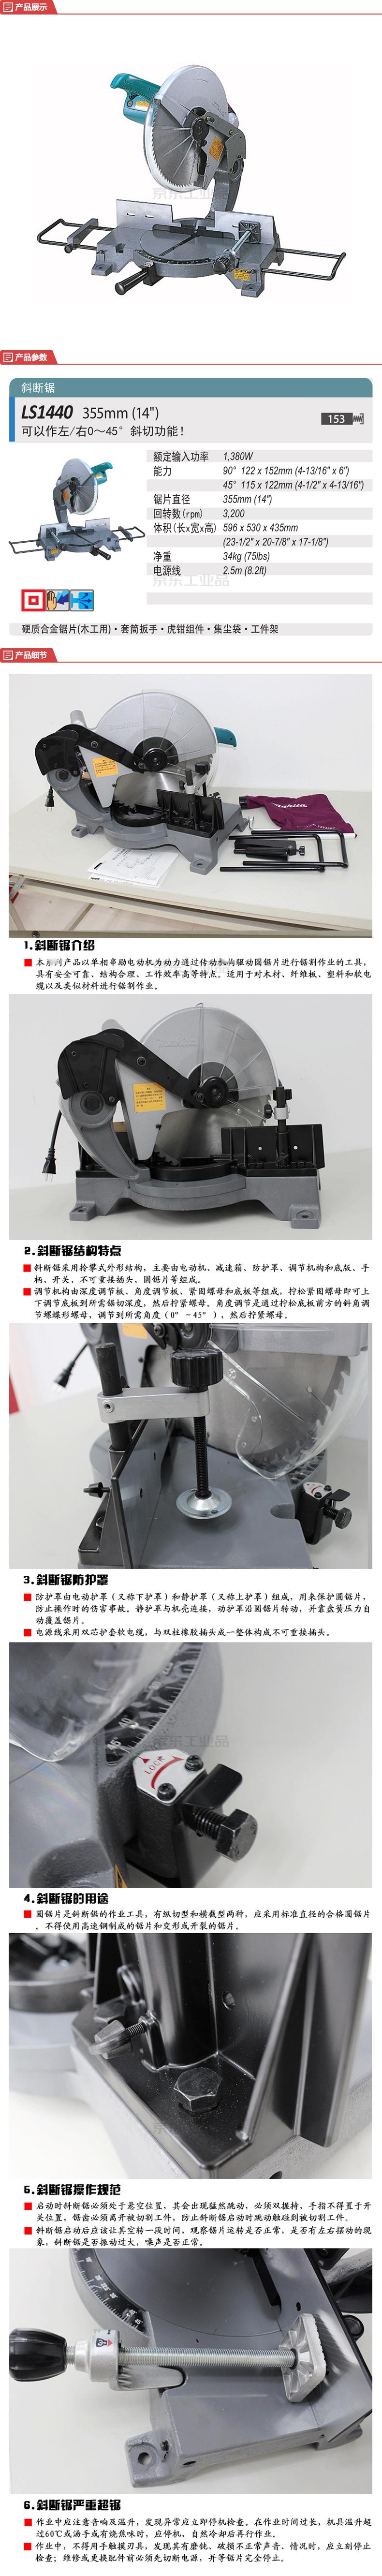 牧田(makita) 斜断锯355mm(14寸)进口;LS1440